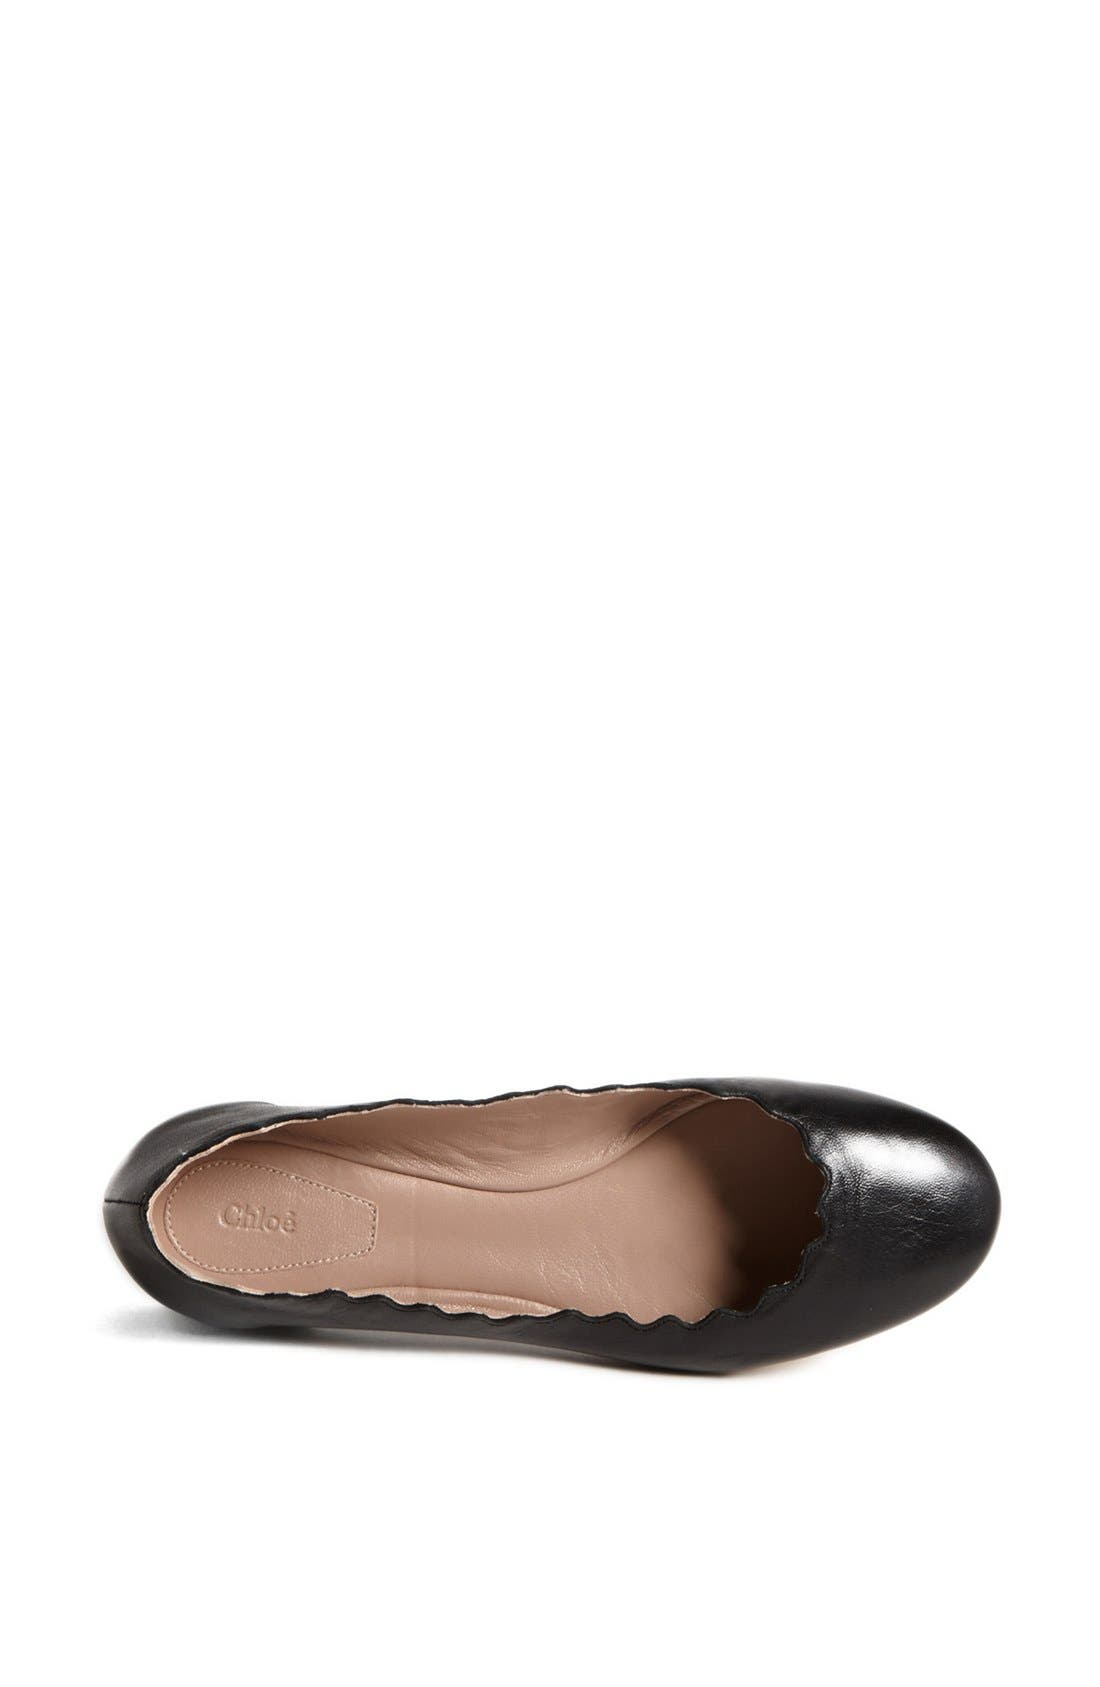 'Lauren' Scalloped Ballet Flat,                             Alternate thumbnail 4, color,                             BLACK LEATHER